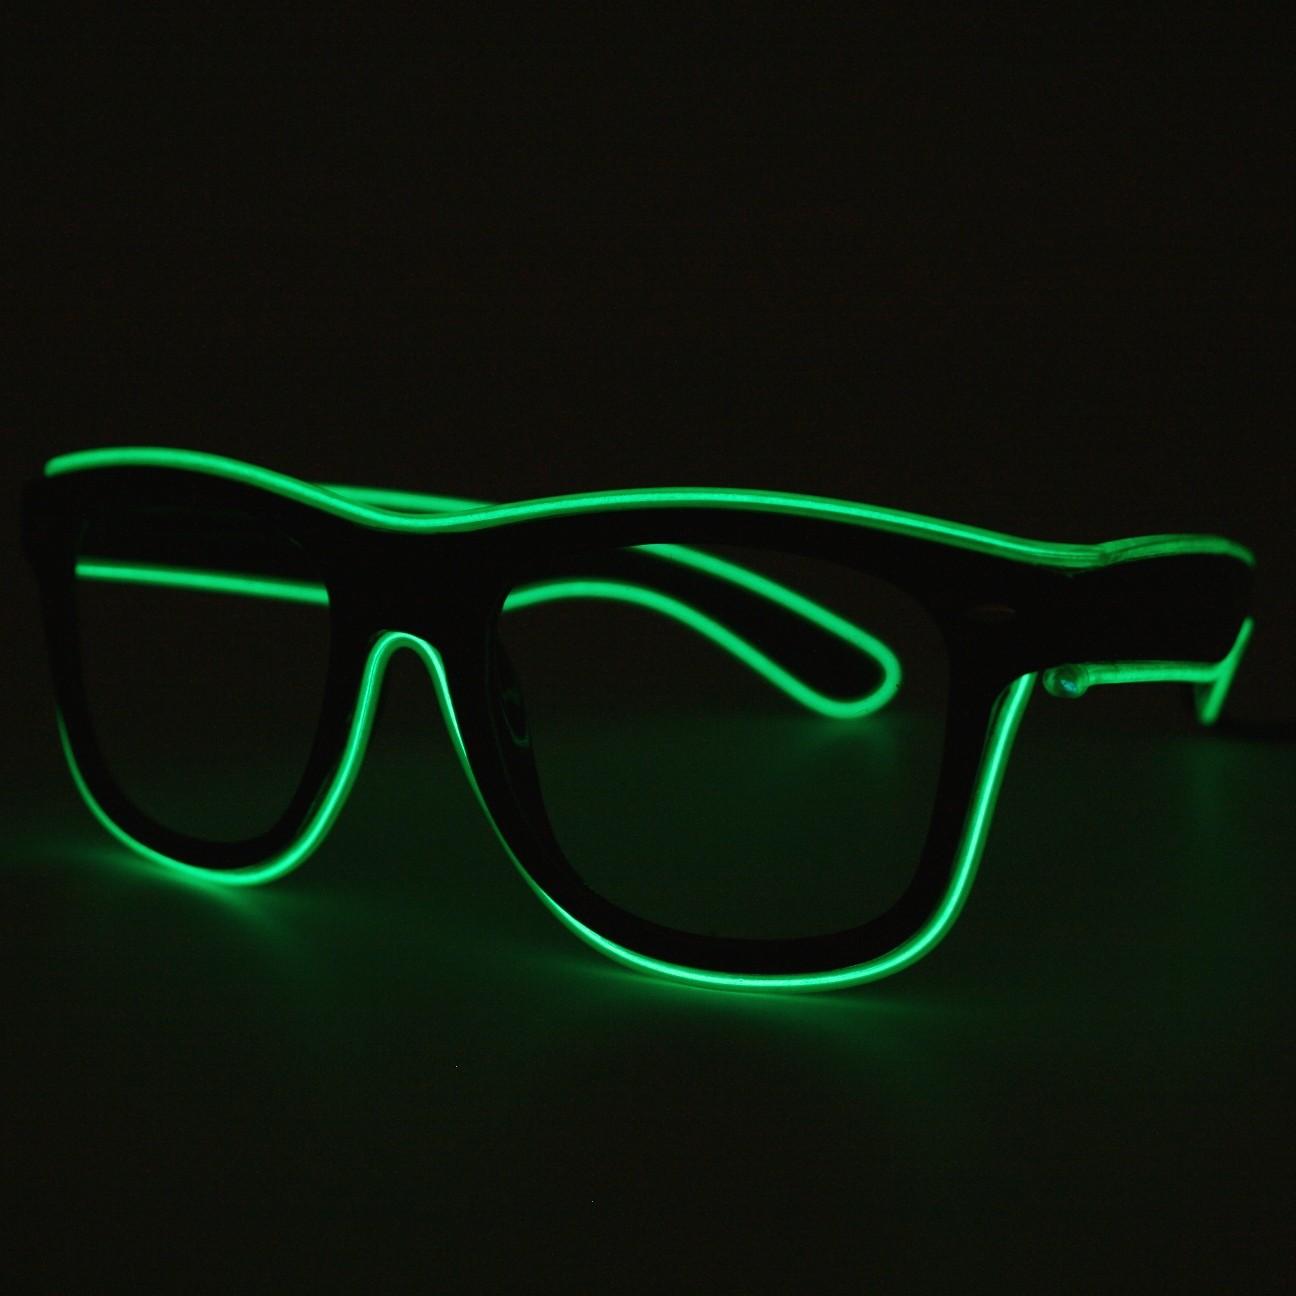 LED Neon Glasses Green Transparent Glasses